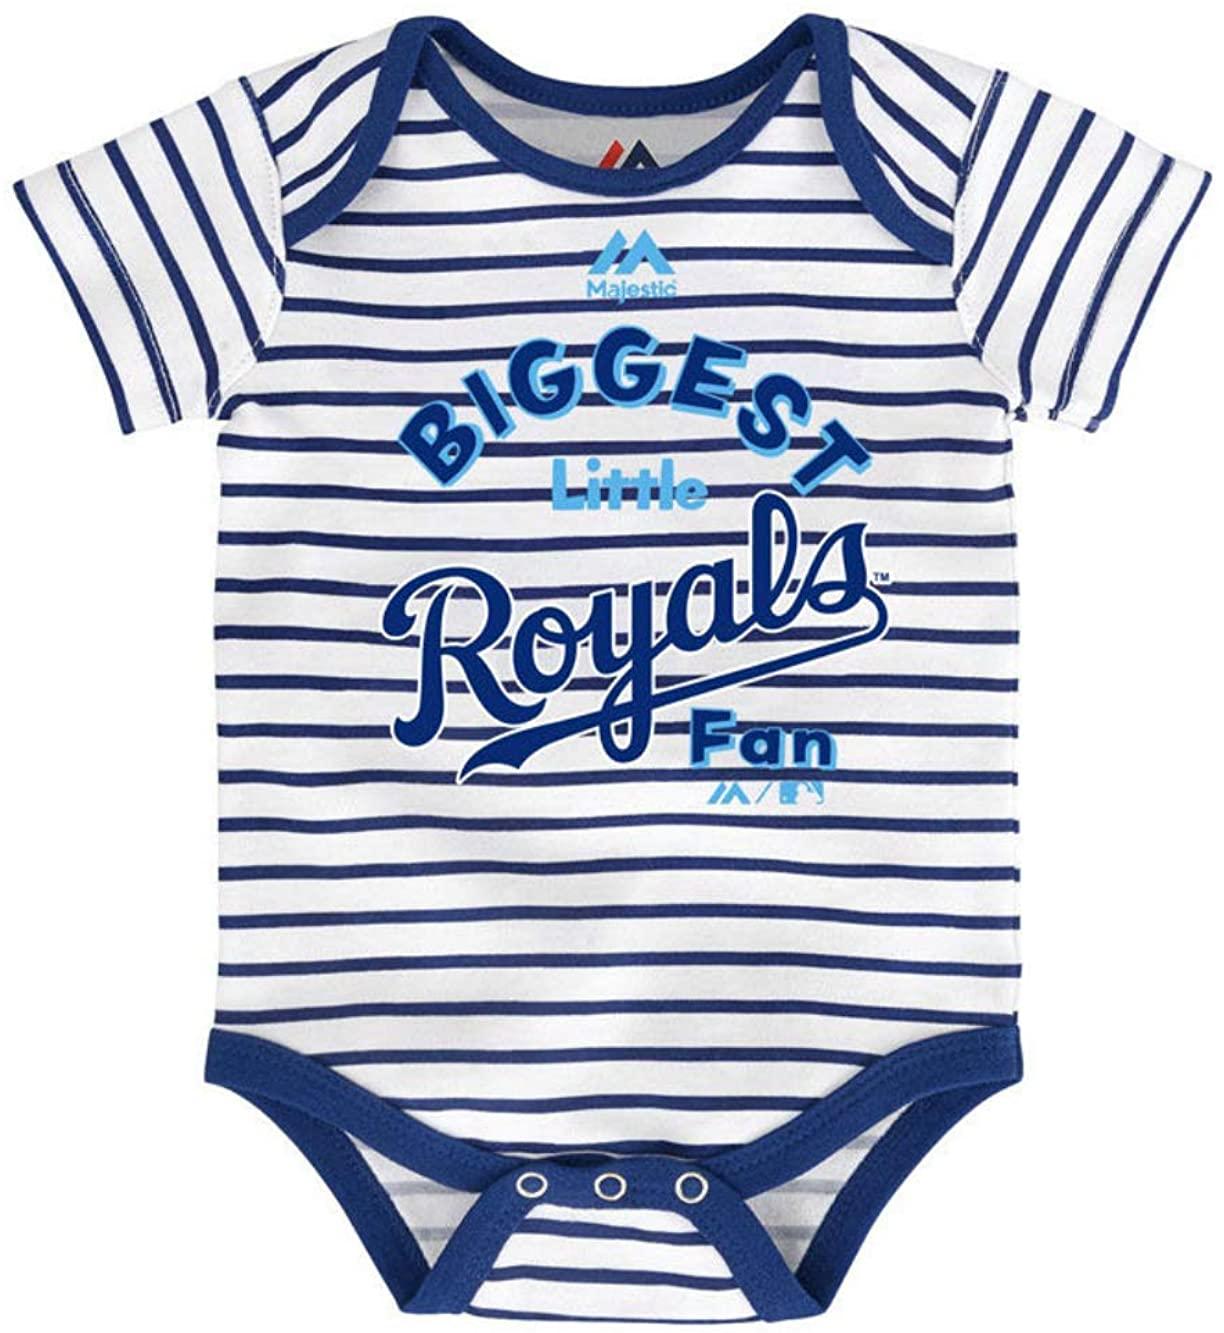 Majestic Athletic Kansas City Royals Infant One Piece Size 18 Months Bodysuit Creeper White